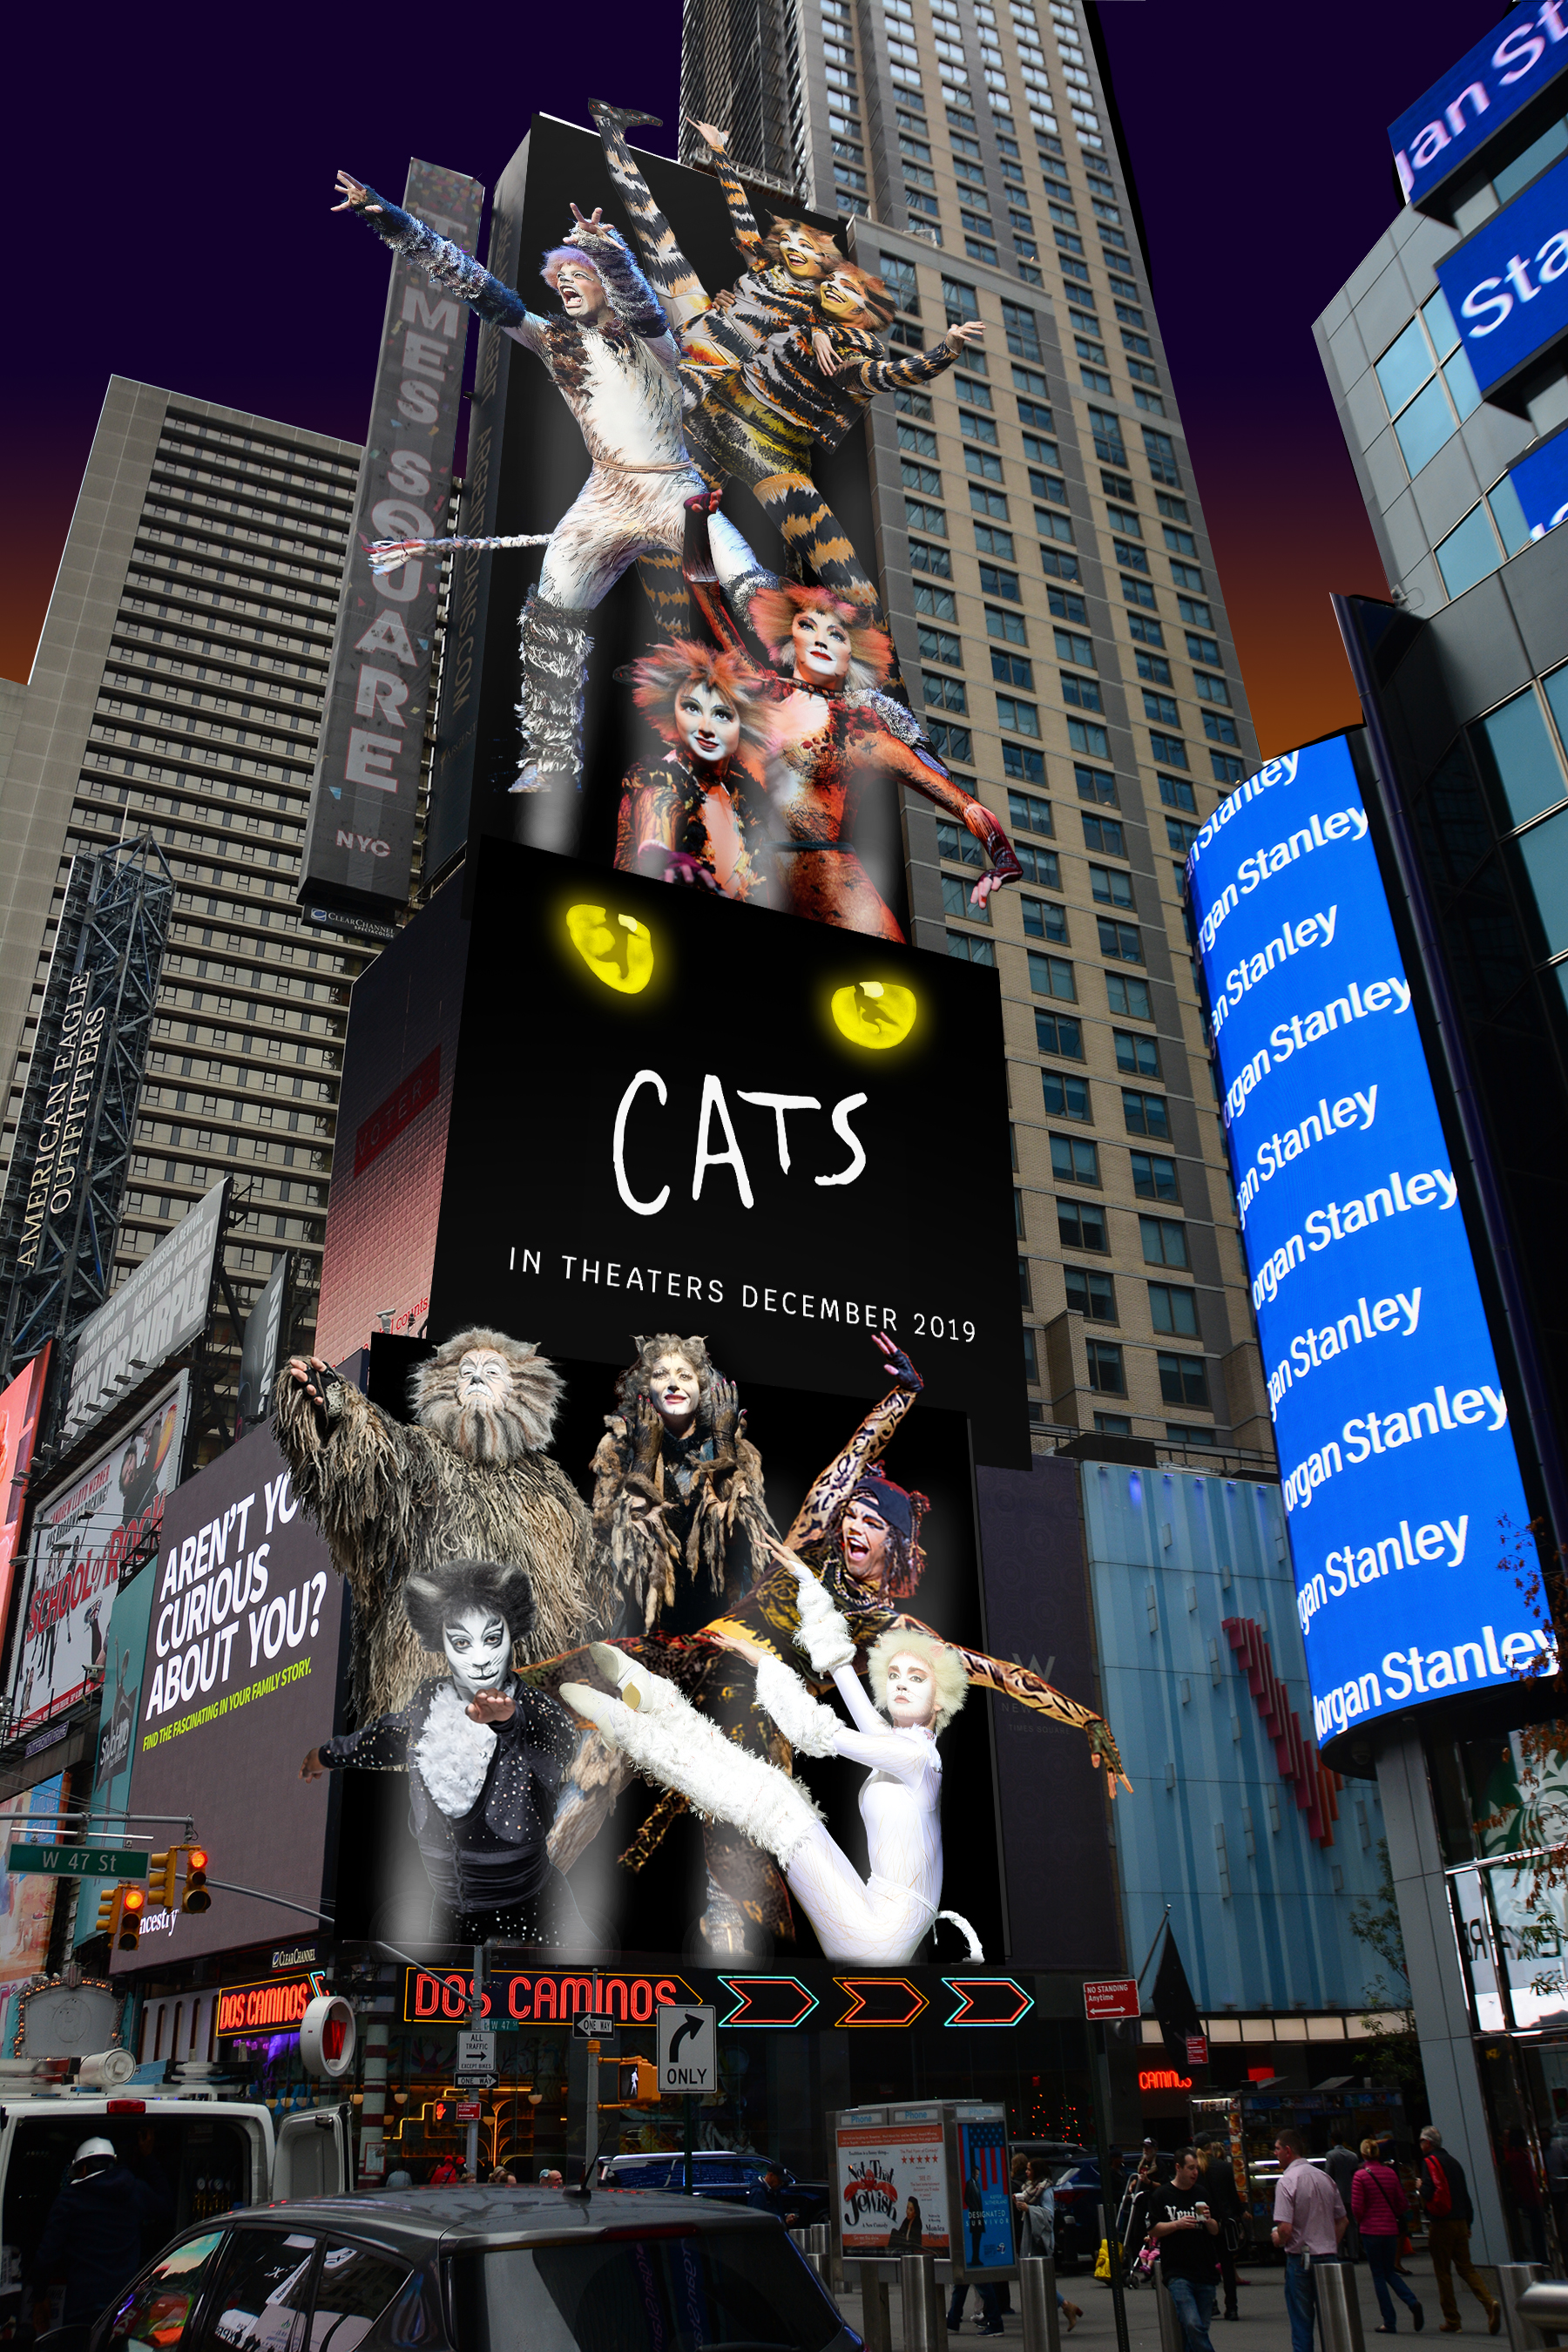 CCO_Cats_Universal_144-135-136_night.jpg